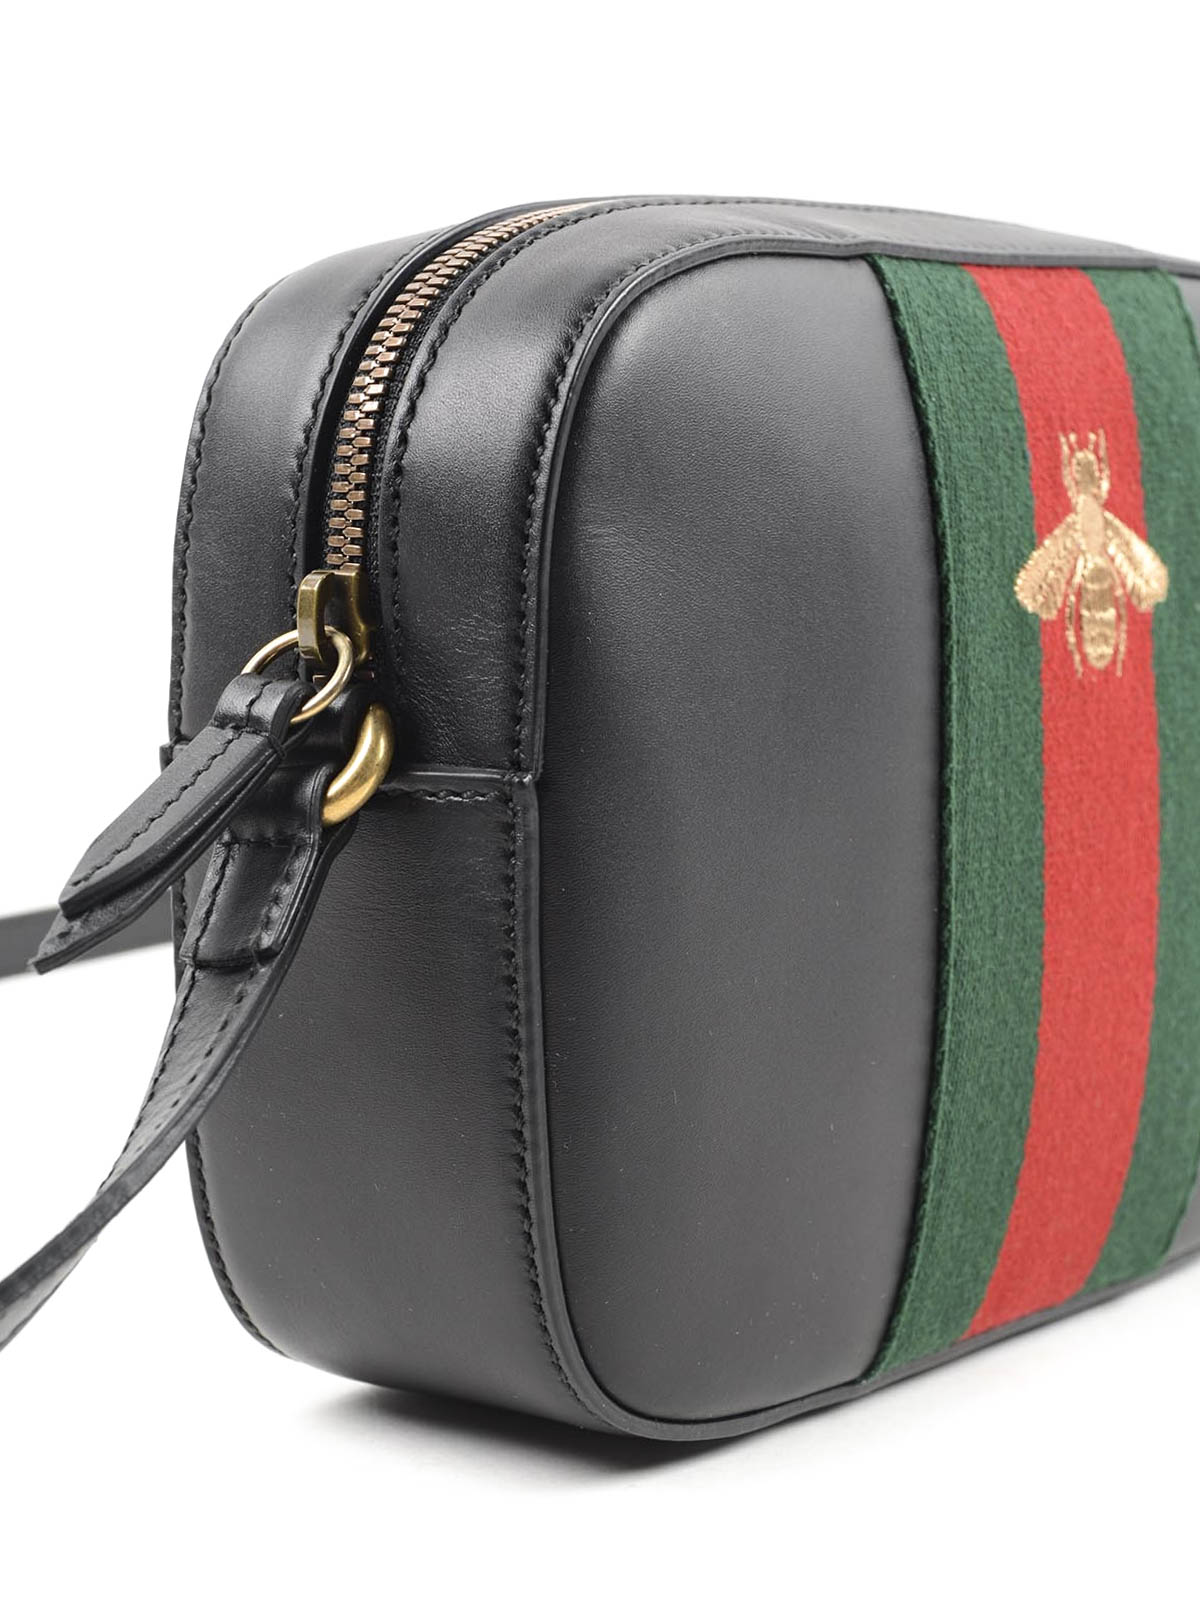 información para 934c2 fdb4d Gucci - Bolsa Bandolera Negra Para Mujer - Bolsas bandoleras ...